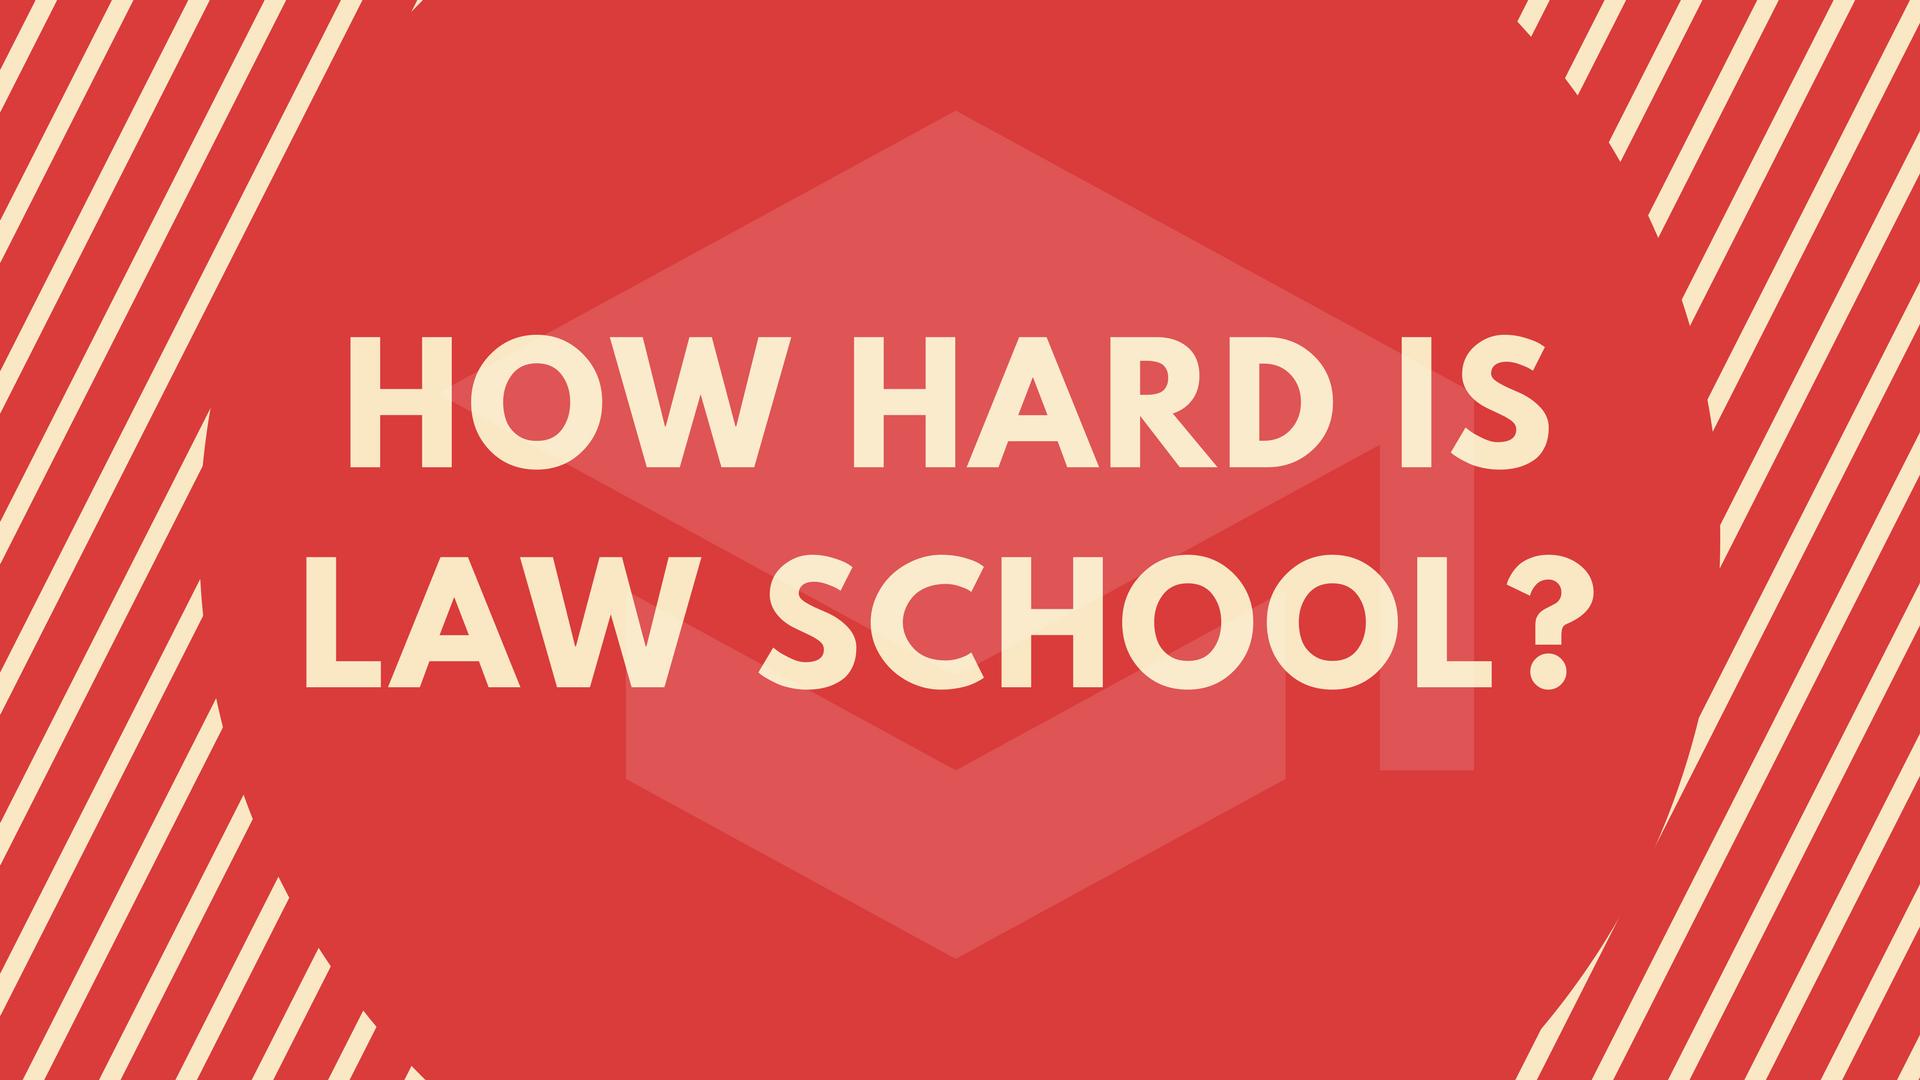 How Hard Is Law School Lawschooli